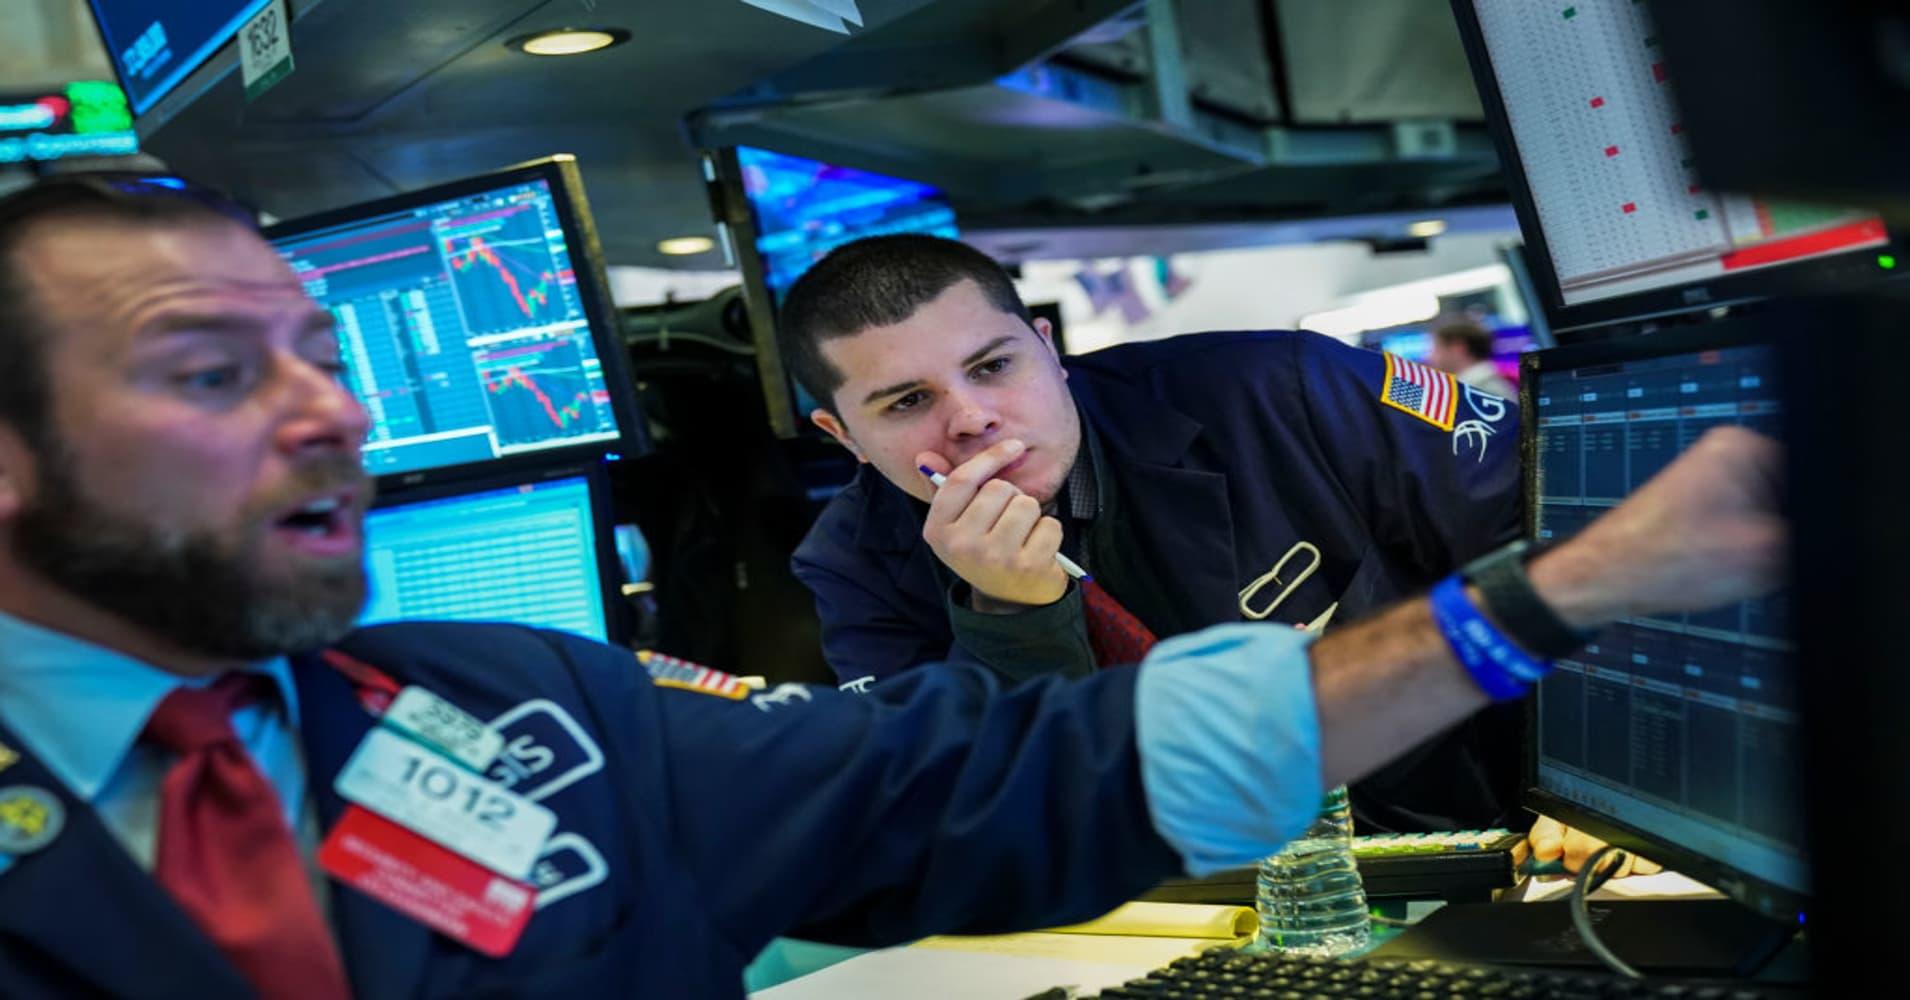 Stocks making the biggest moves premarket: Tesla, CVS Health, Eli Lilly, Netflix & more